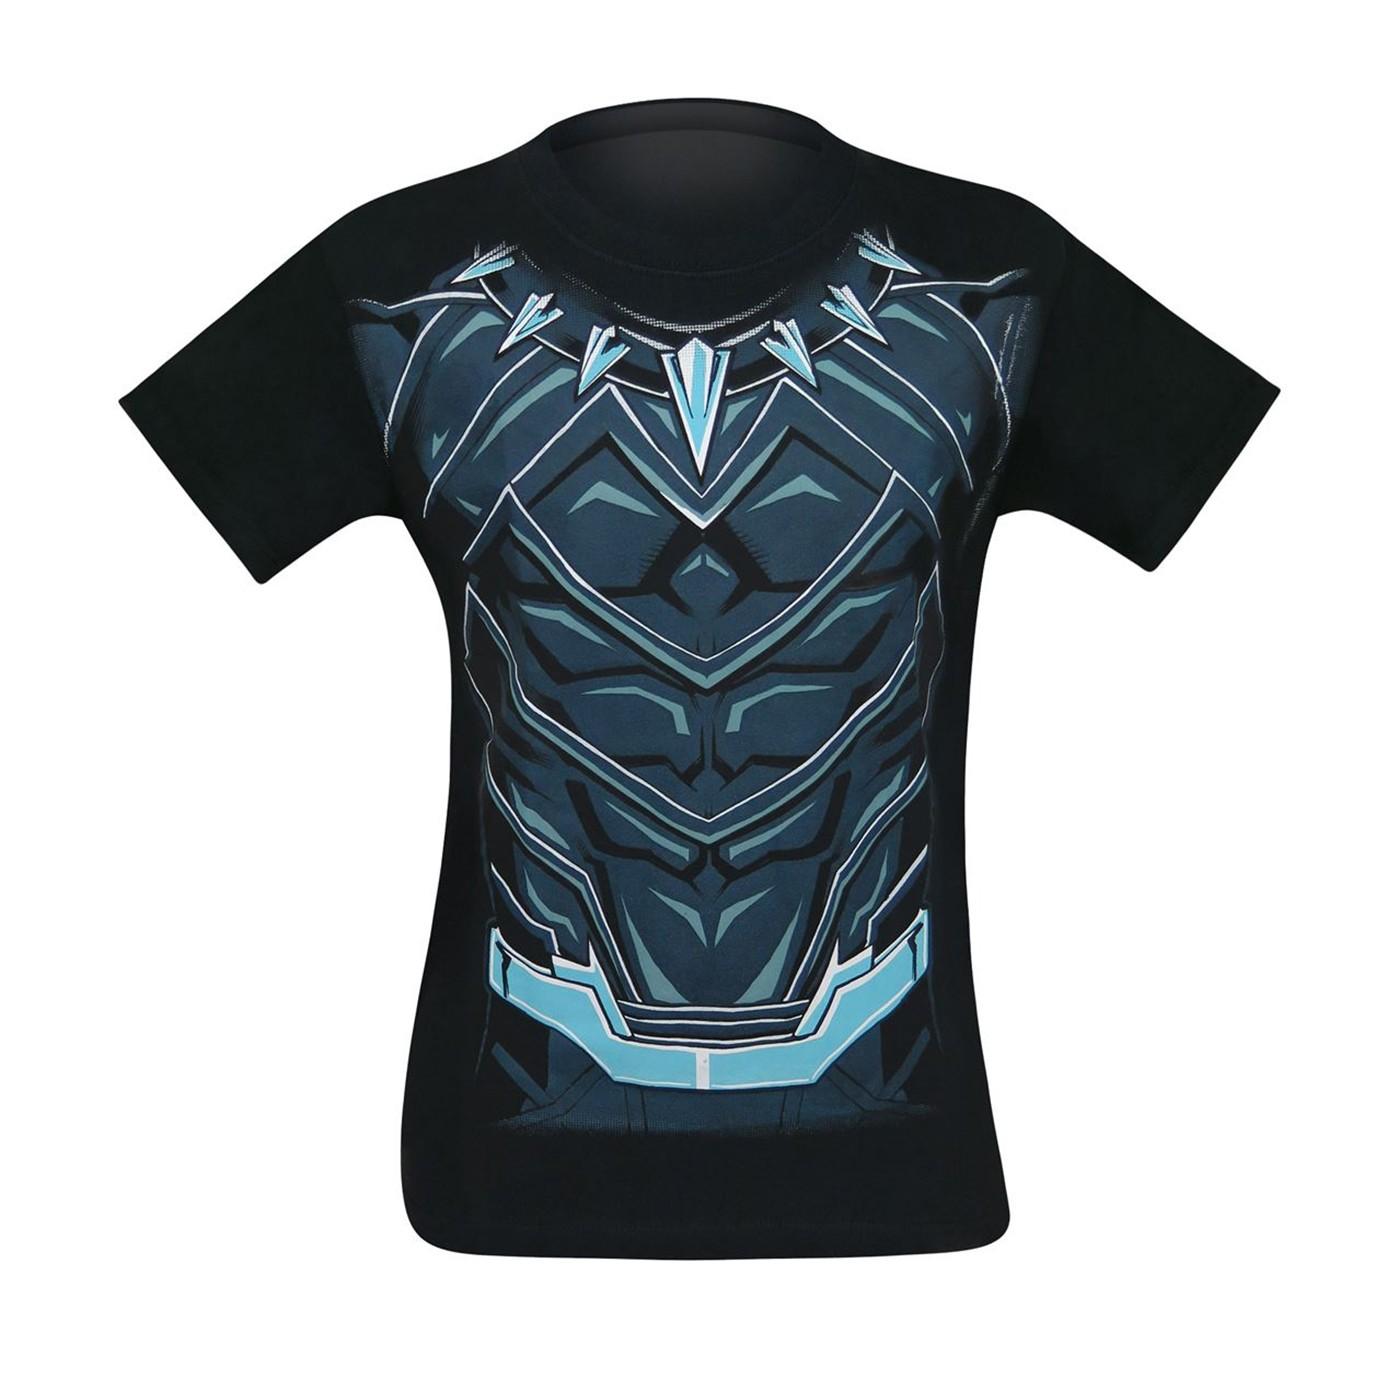 Black Panther Suit-Up Men's Costume T-Shirt